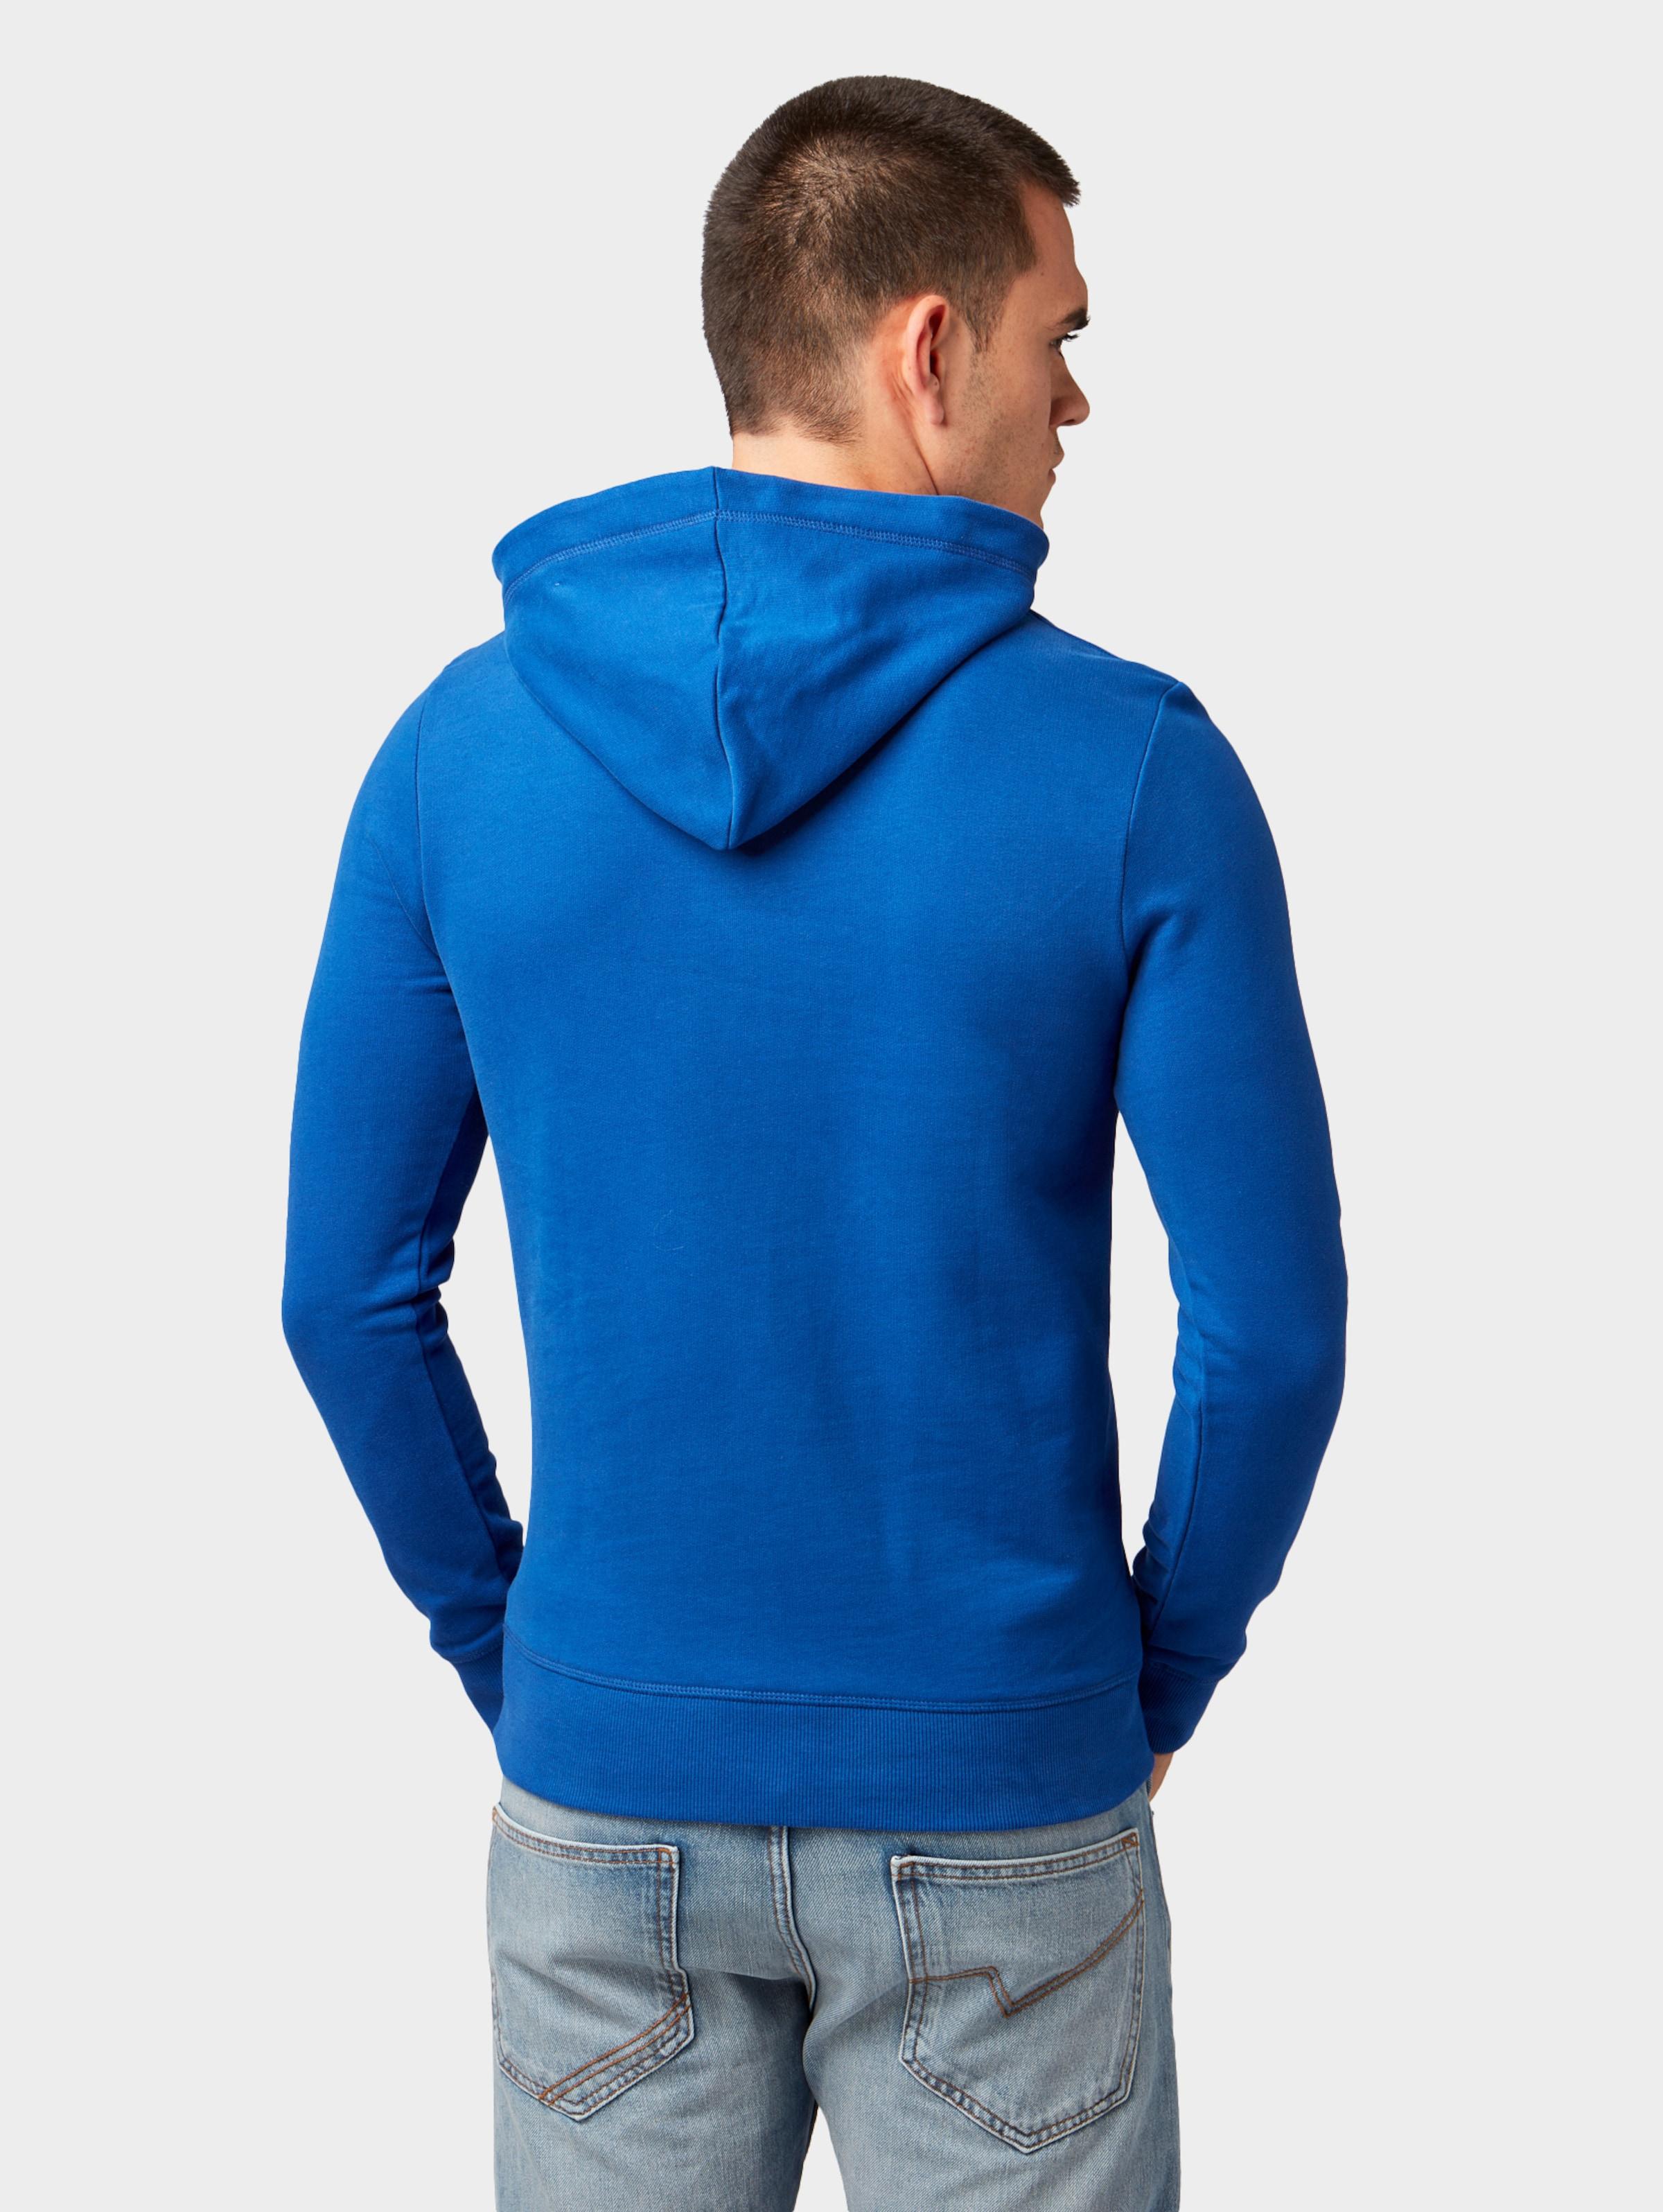 Tailor Blau Hoodie In Denim Tom QdsthrC